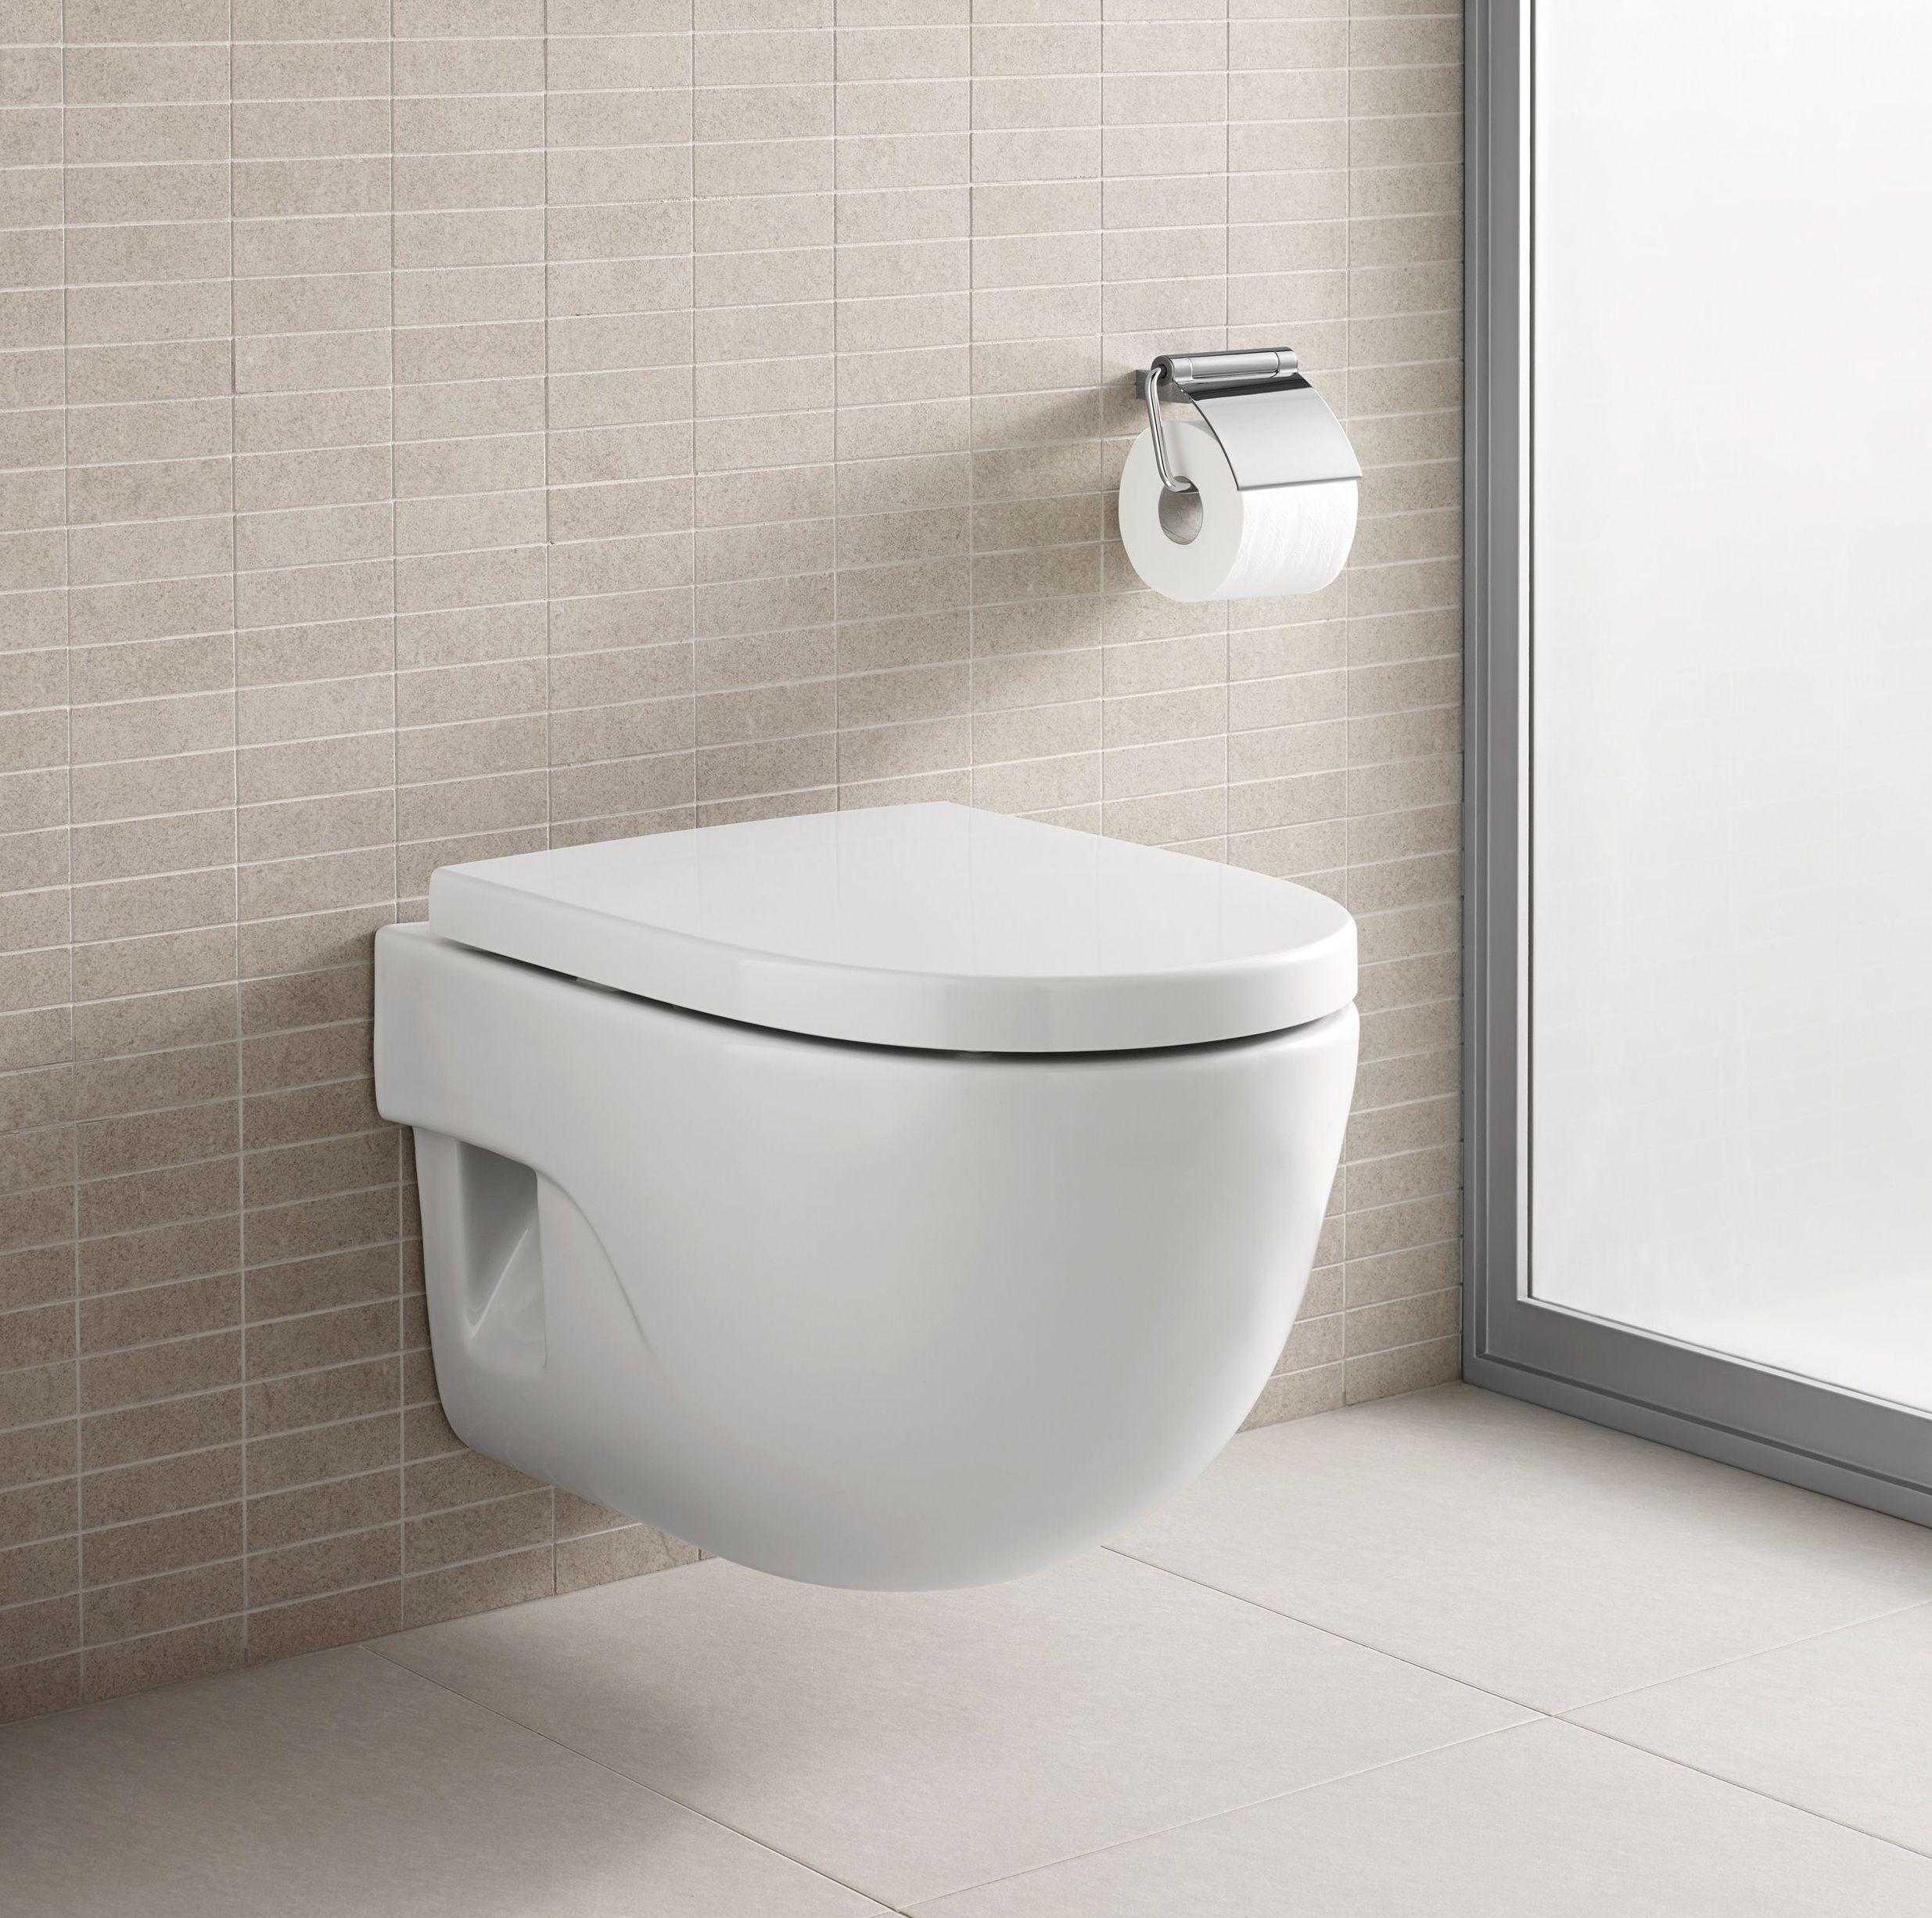 Picture of: Bathroom Toilets Basins Toilet Sink Complete Bathroom Packages Deals City Plumbing Supplies